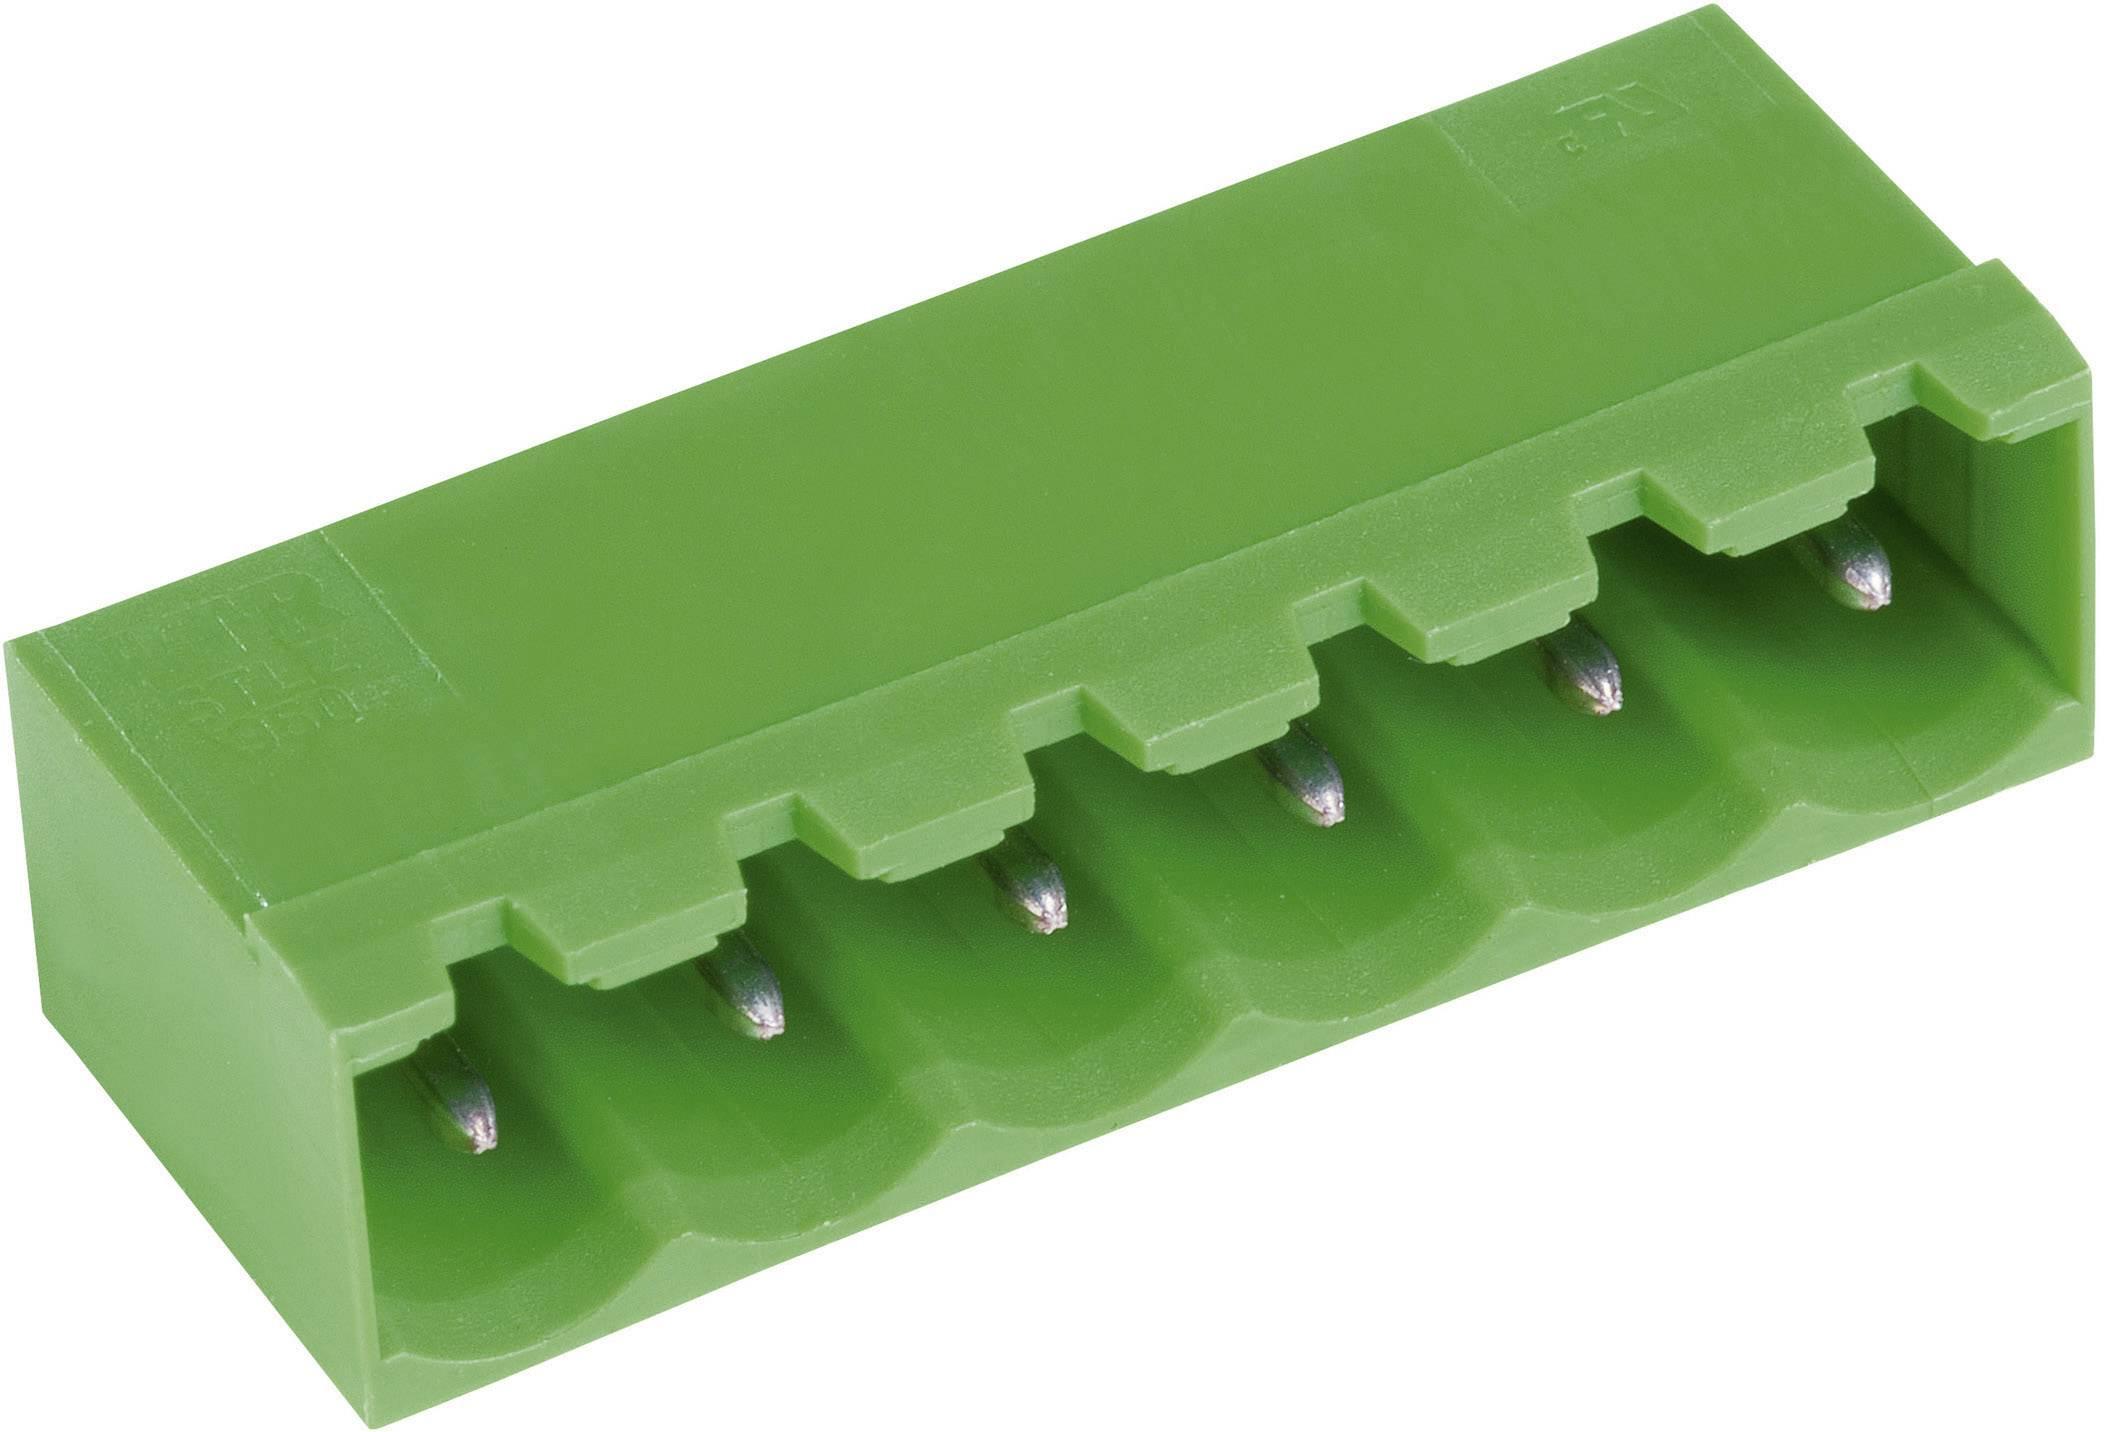 Konektor do DPS PTR STLZ950/8G-5.08-H 50950085021D, 41.84 mm, pólů 8, rozteč 5.08 mm, 1 ks